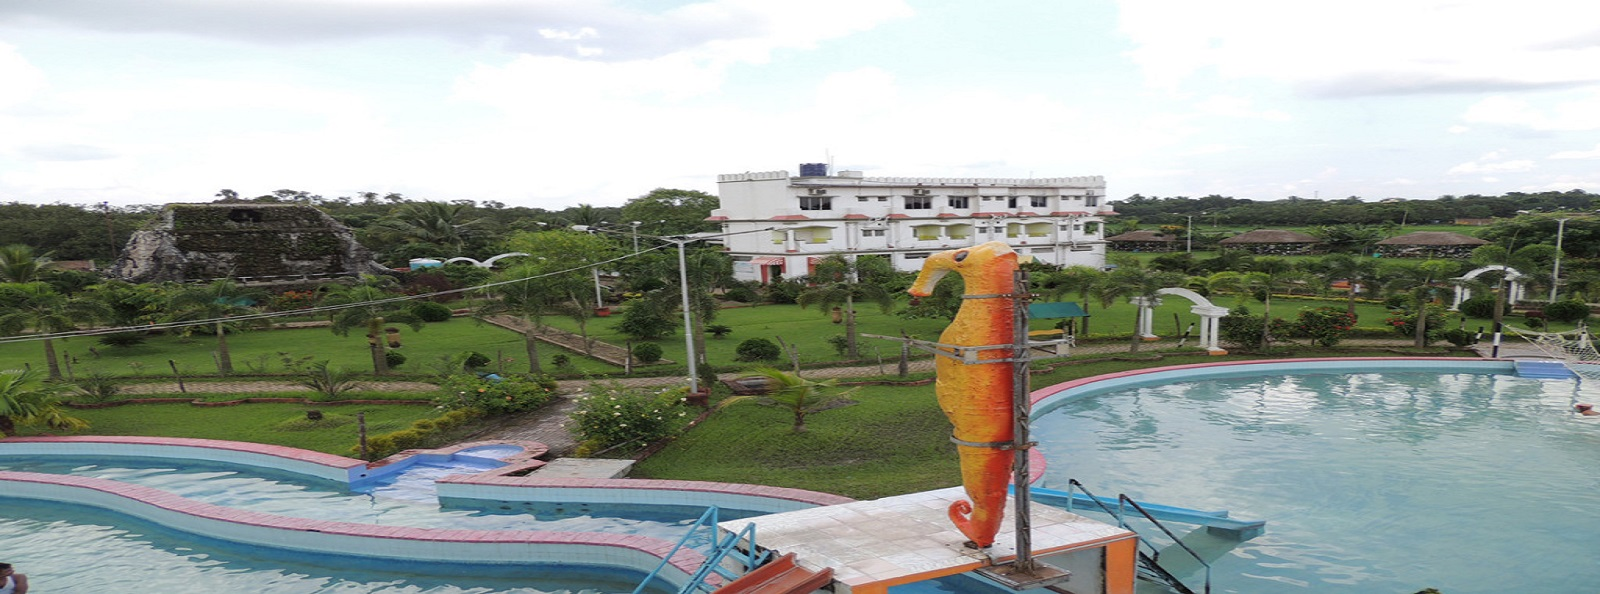 Aquamarina >> Aquamarina Water Theme Park Resorts Hooghly